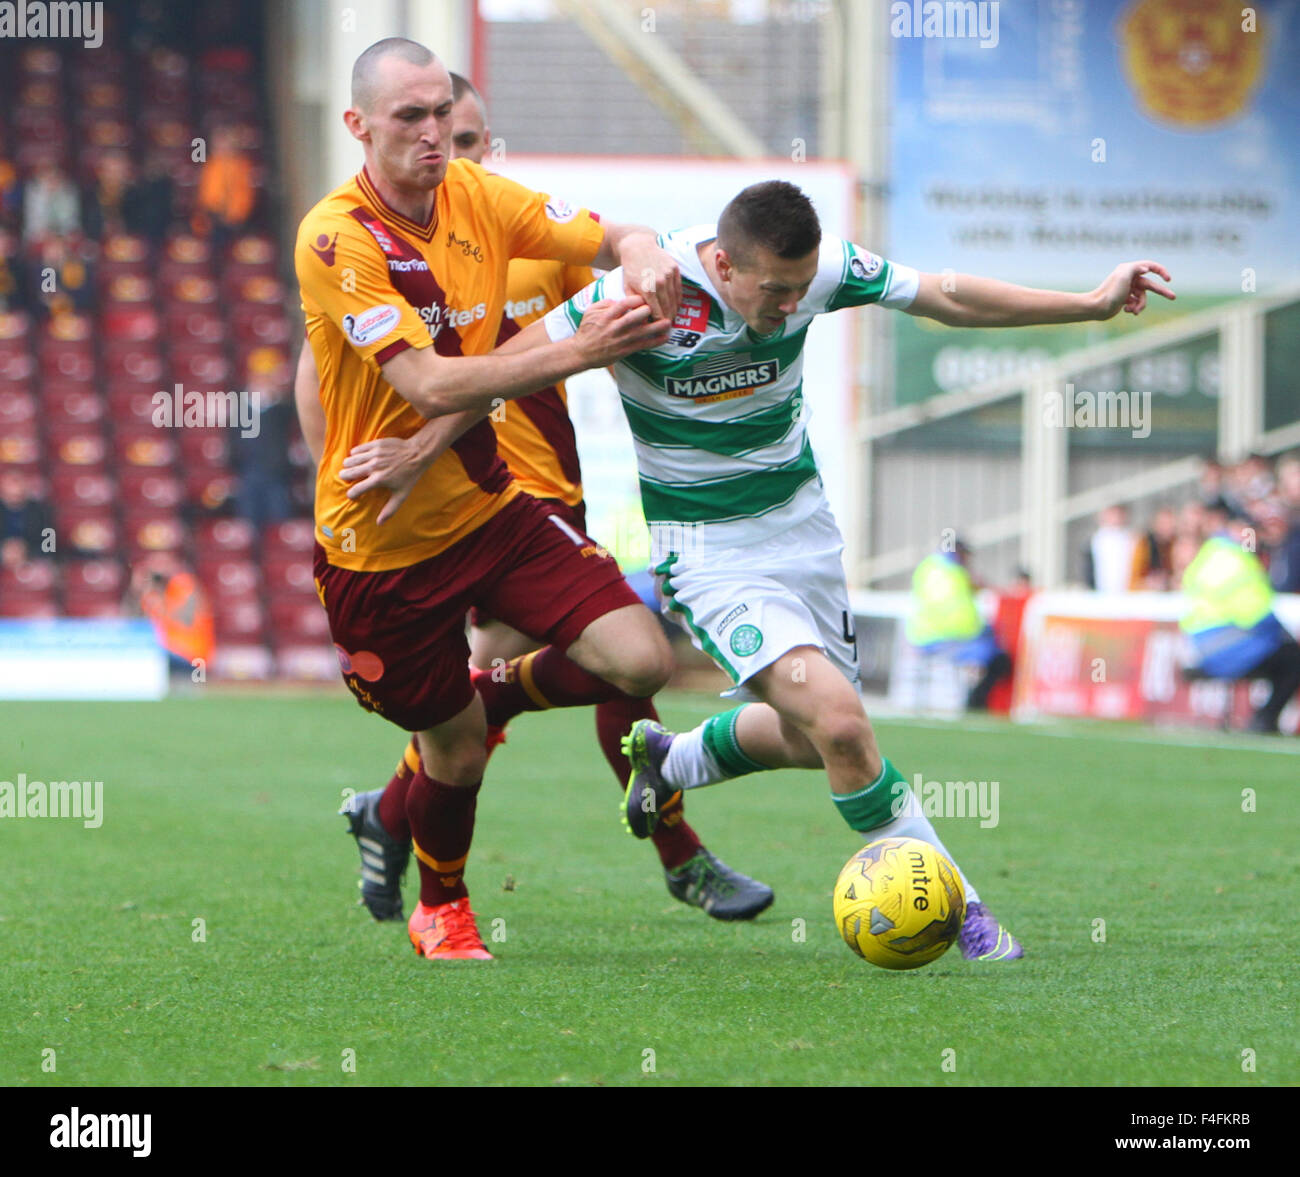 Fir Park, Motherwell, Scotland. 17th Oct, 2015. Scottish Premier League. Motherwell versus Celtic. Joe Chalmers - Stock Image